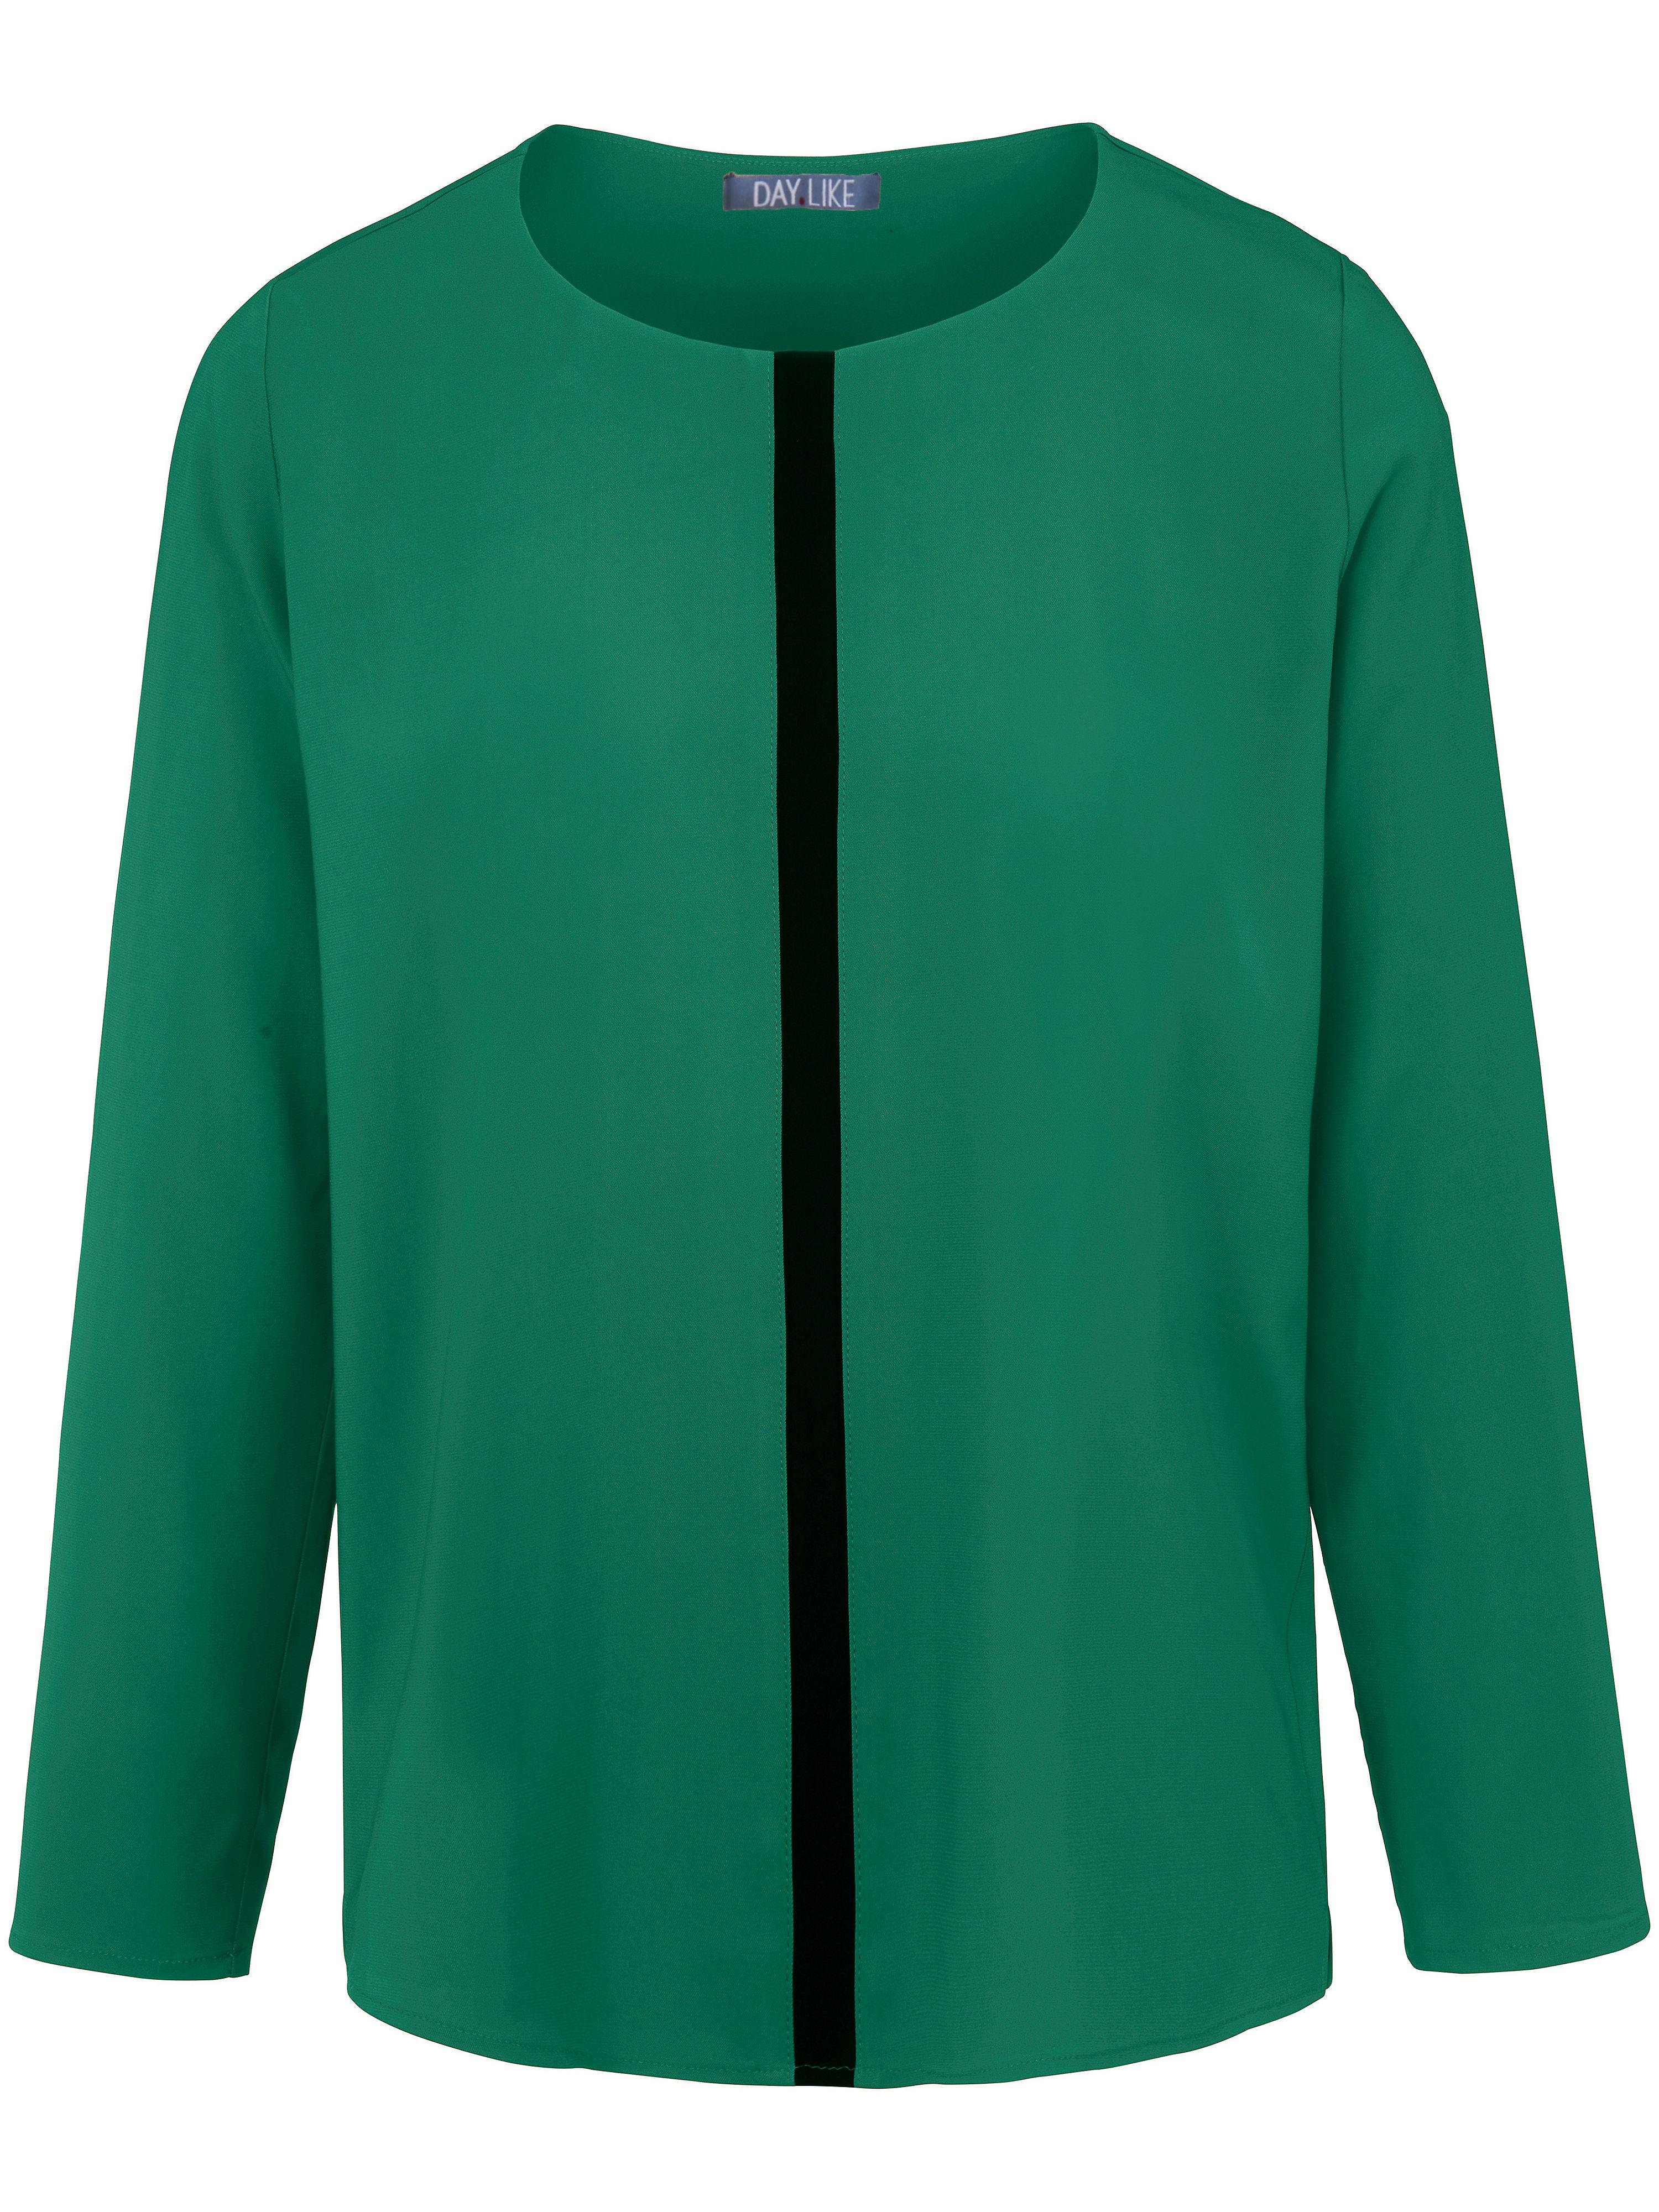 e09d50bb9dc99b Bekleidung » Damen-Shirts online kaufen | Damenmode-Suchmaschine ...